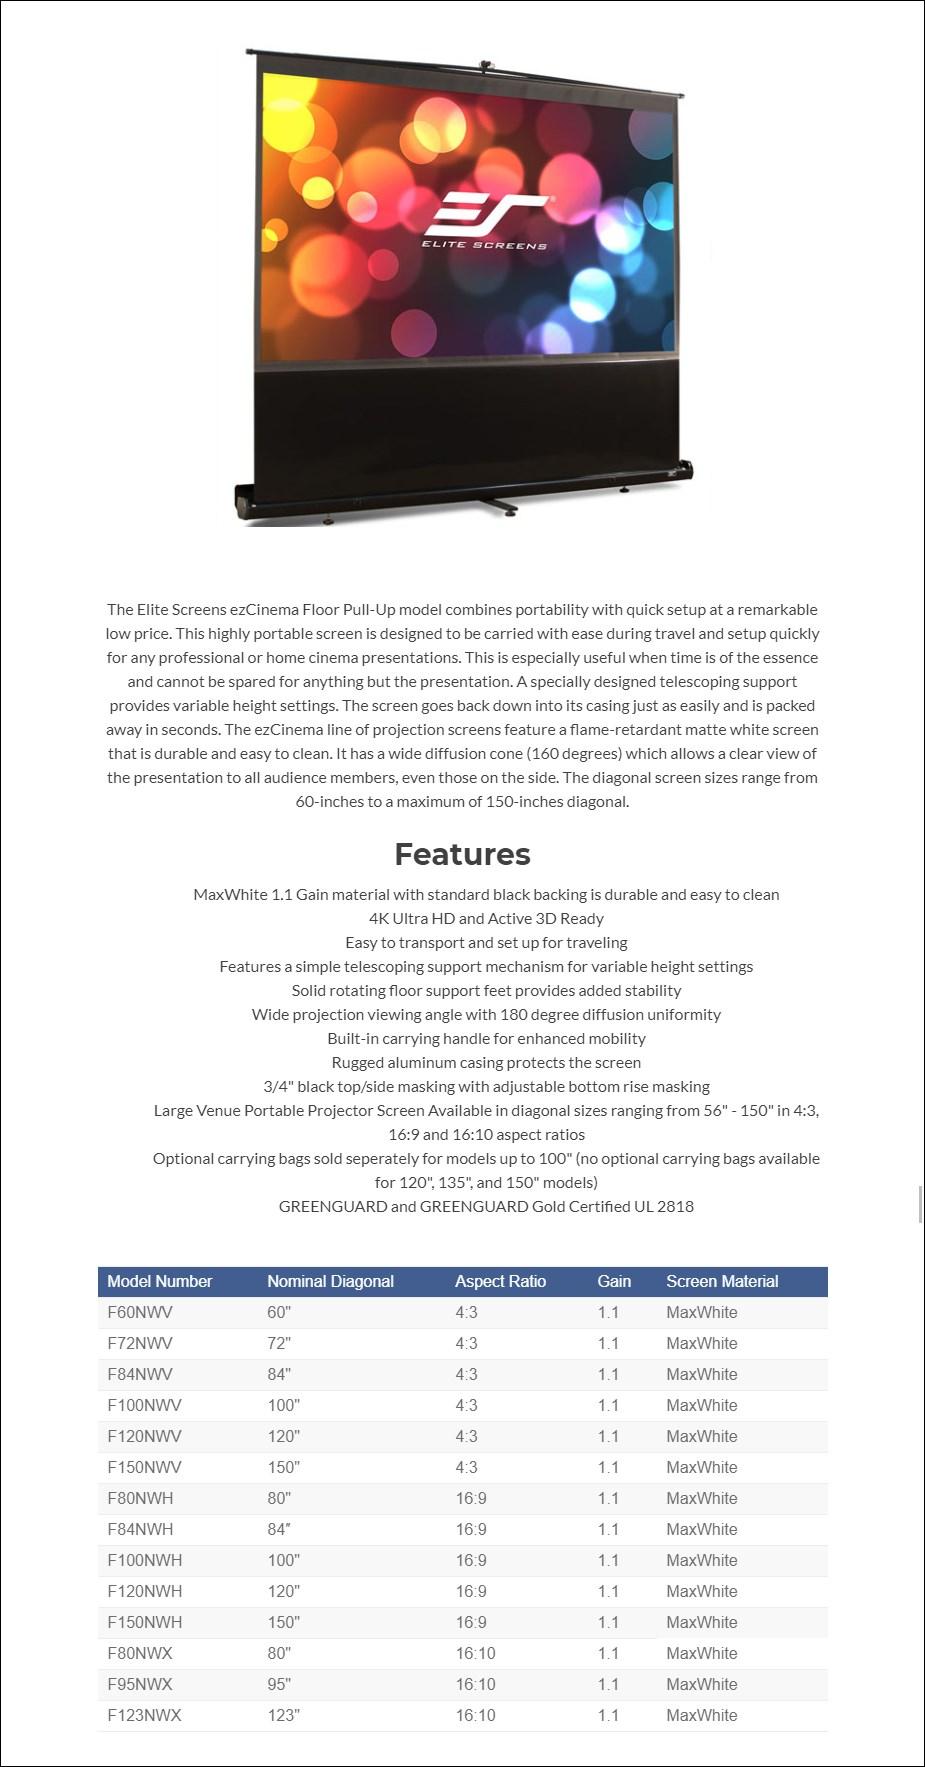 elite-screens-ezcinema-60-43-floor-pullup-projection-screen-ac30909-1-3-.jpg